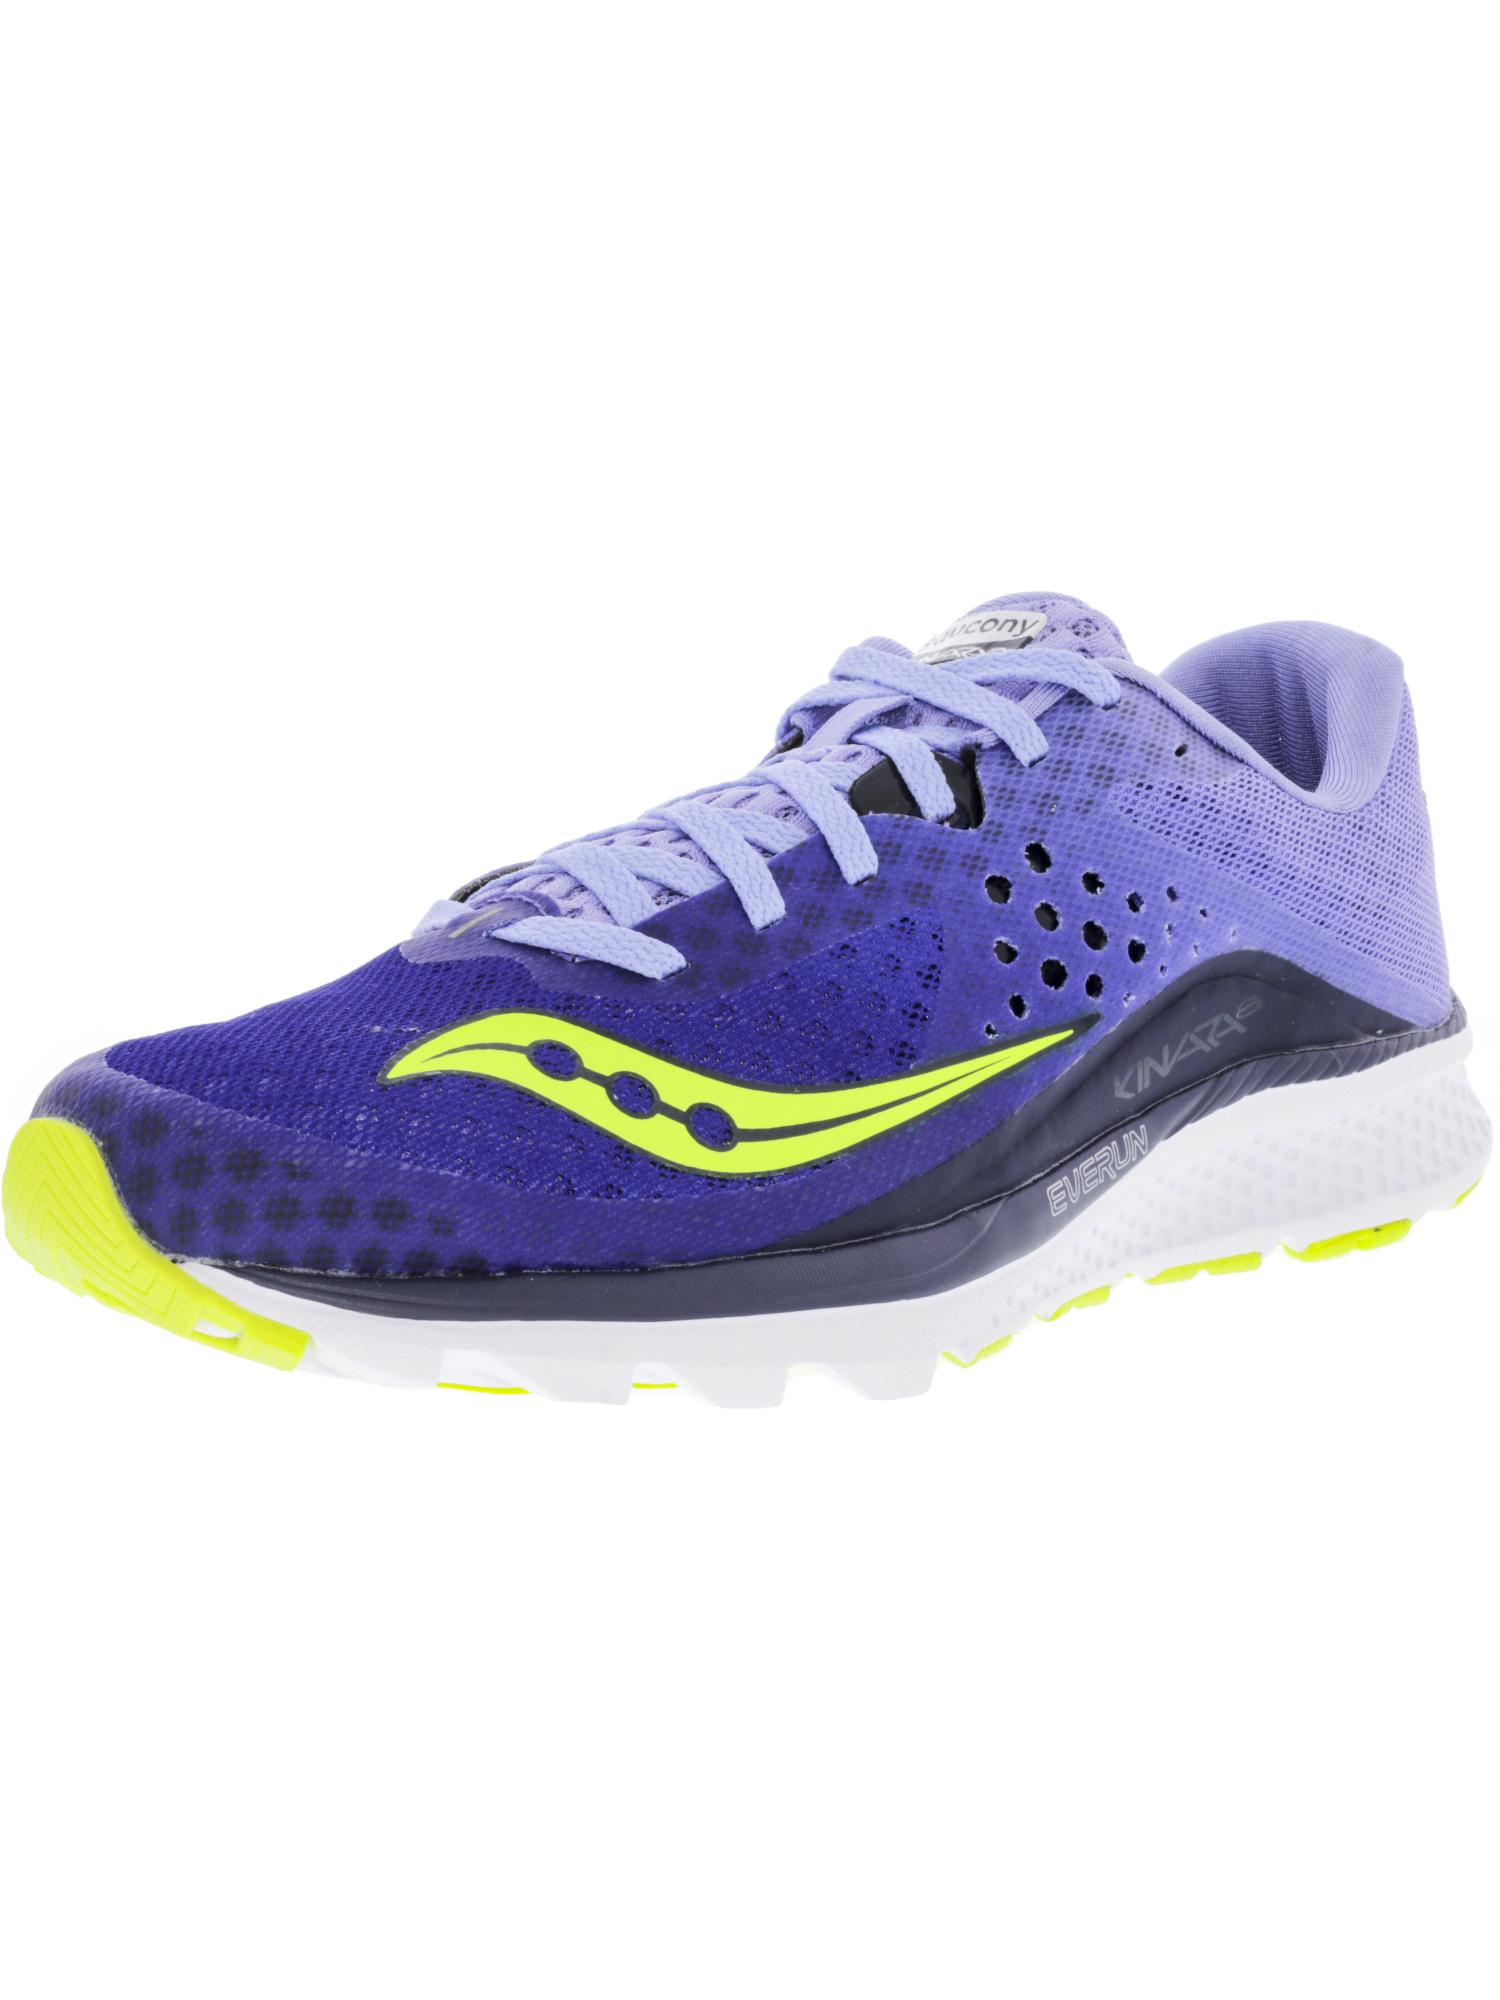 Run fast. Run effortlessly in the Kinvara 8 Saucony